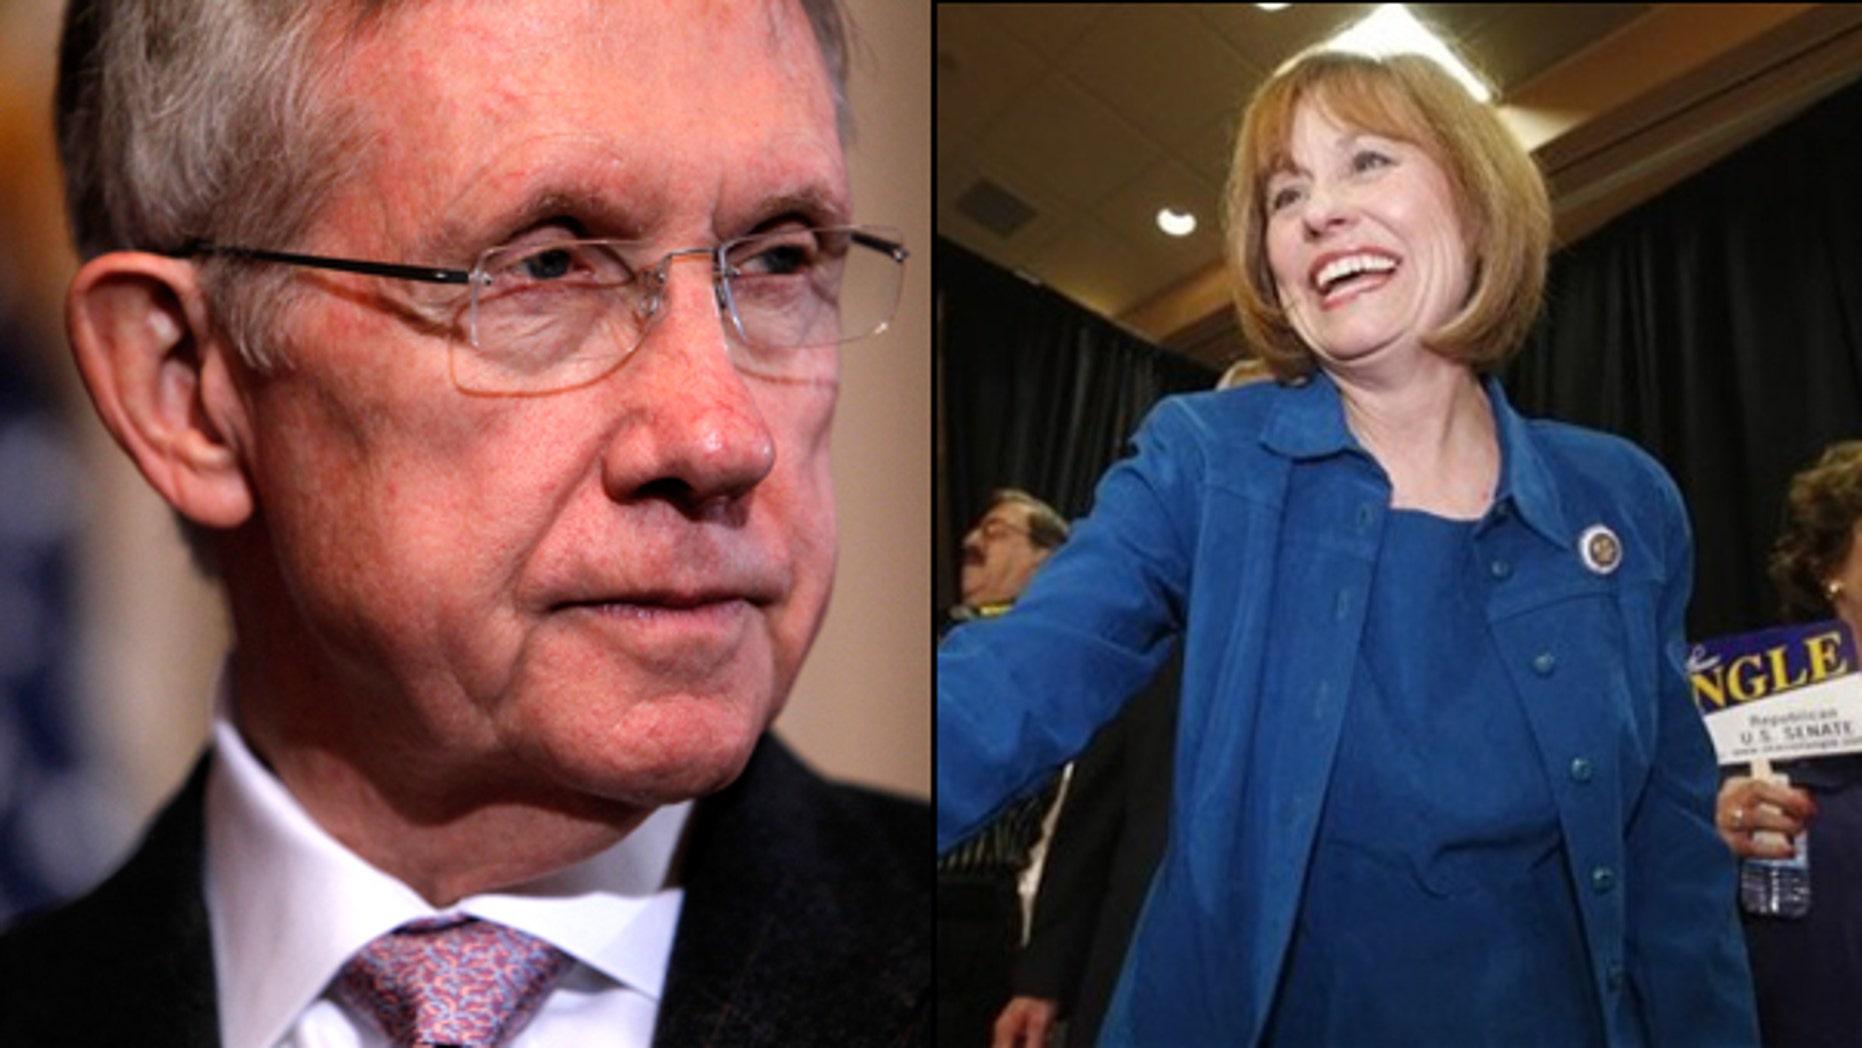 Senate Majority Leader Harry Reid is taking on Tea Party darling Sharron Angle in the November midterm elections. (AP)